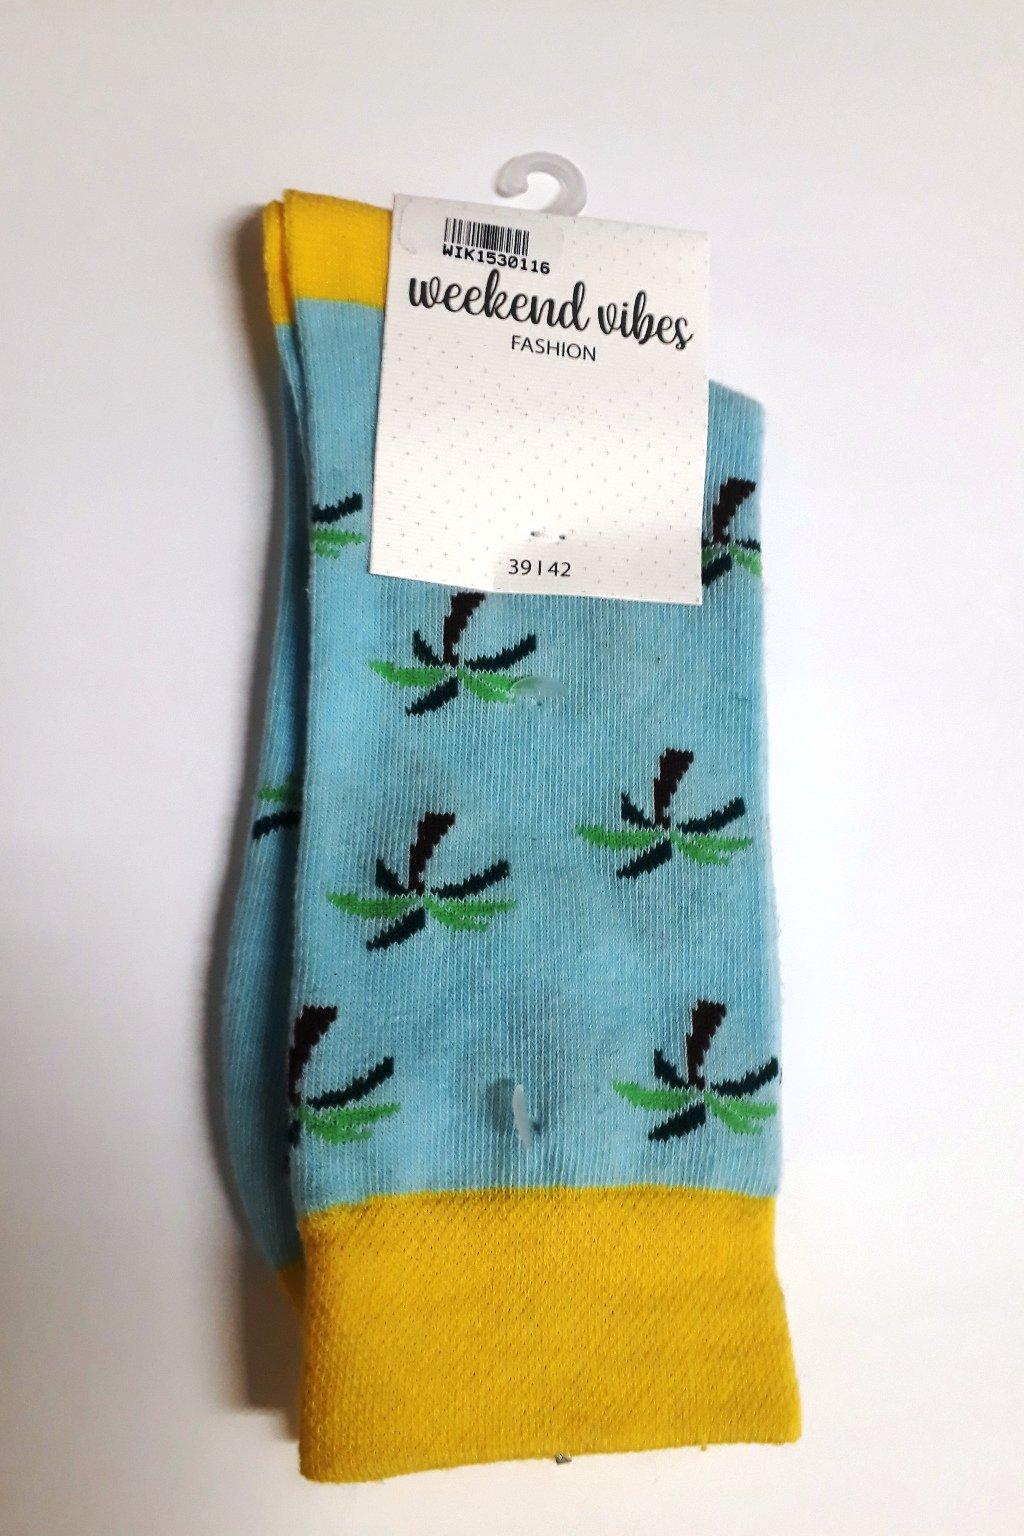 Veselé ponožky Wik weekend vihes 15301 palm